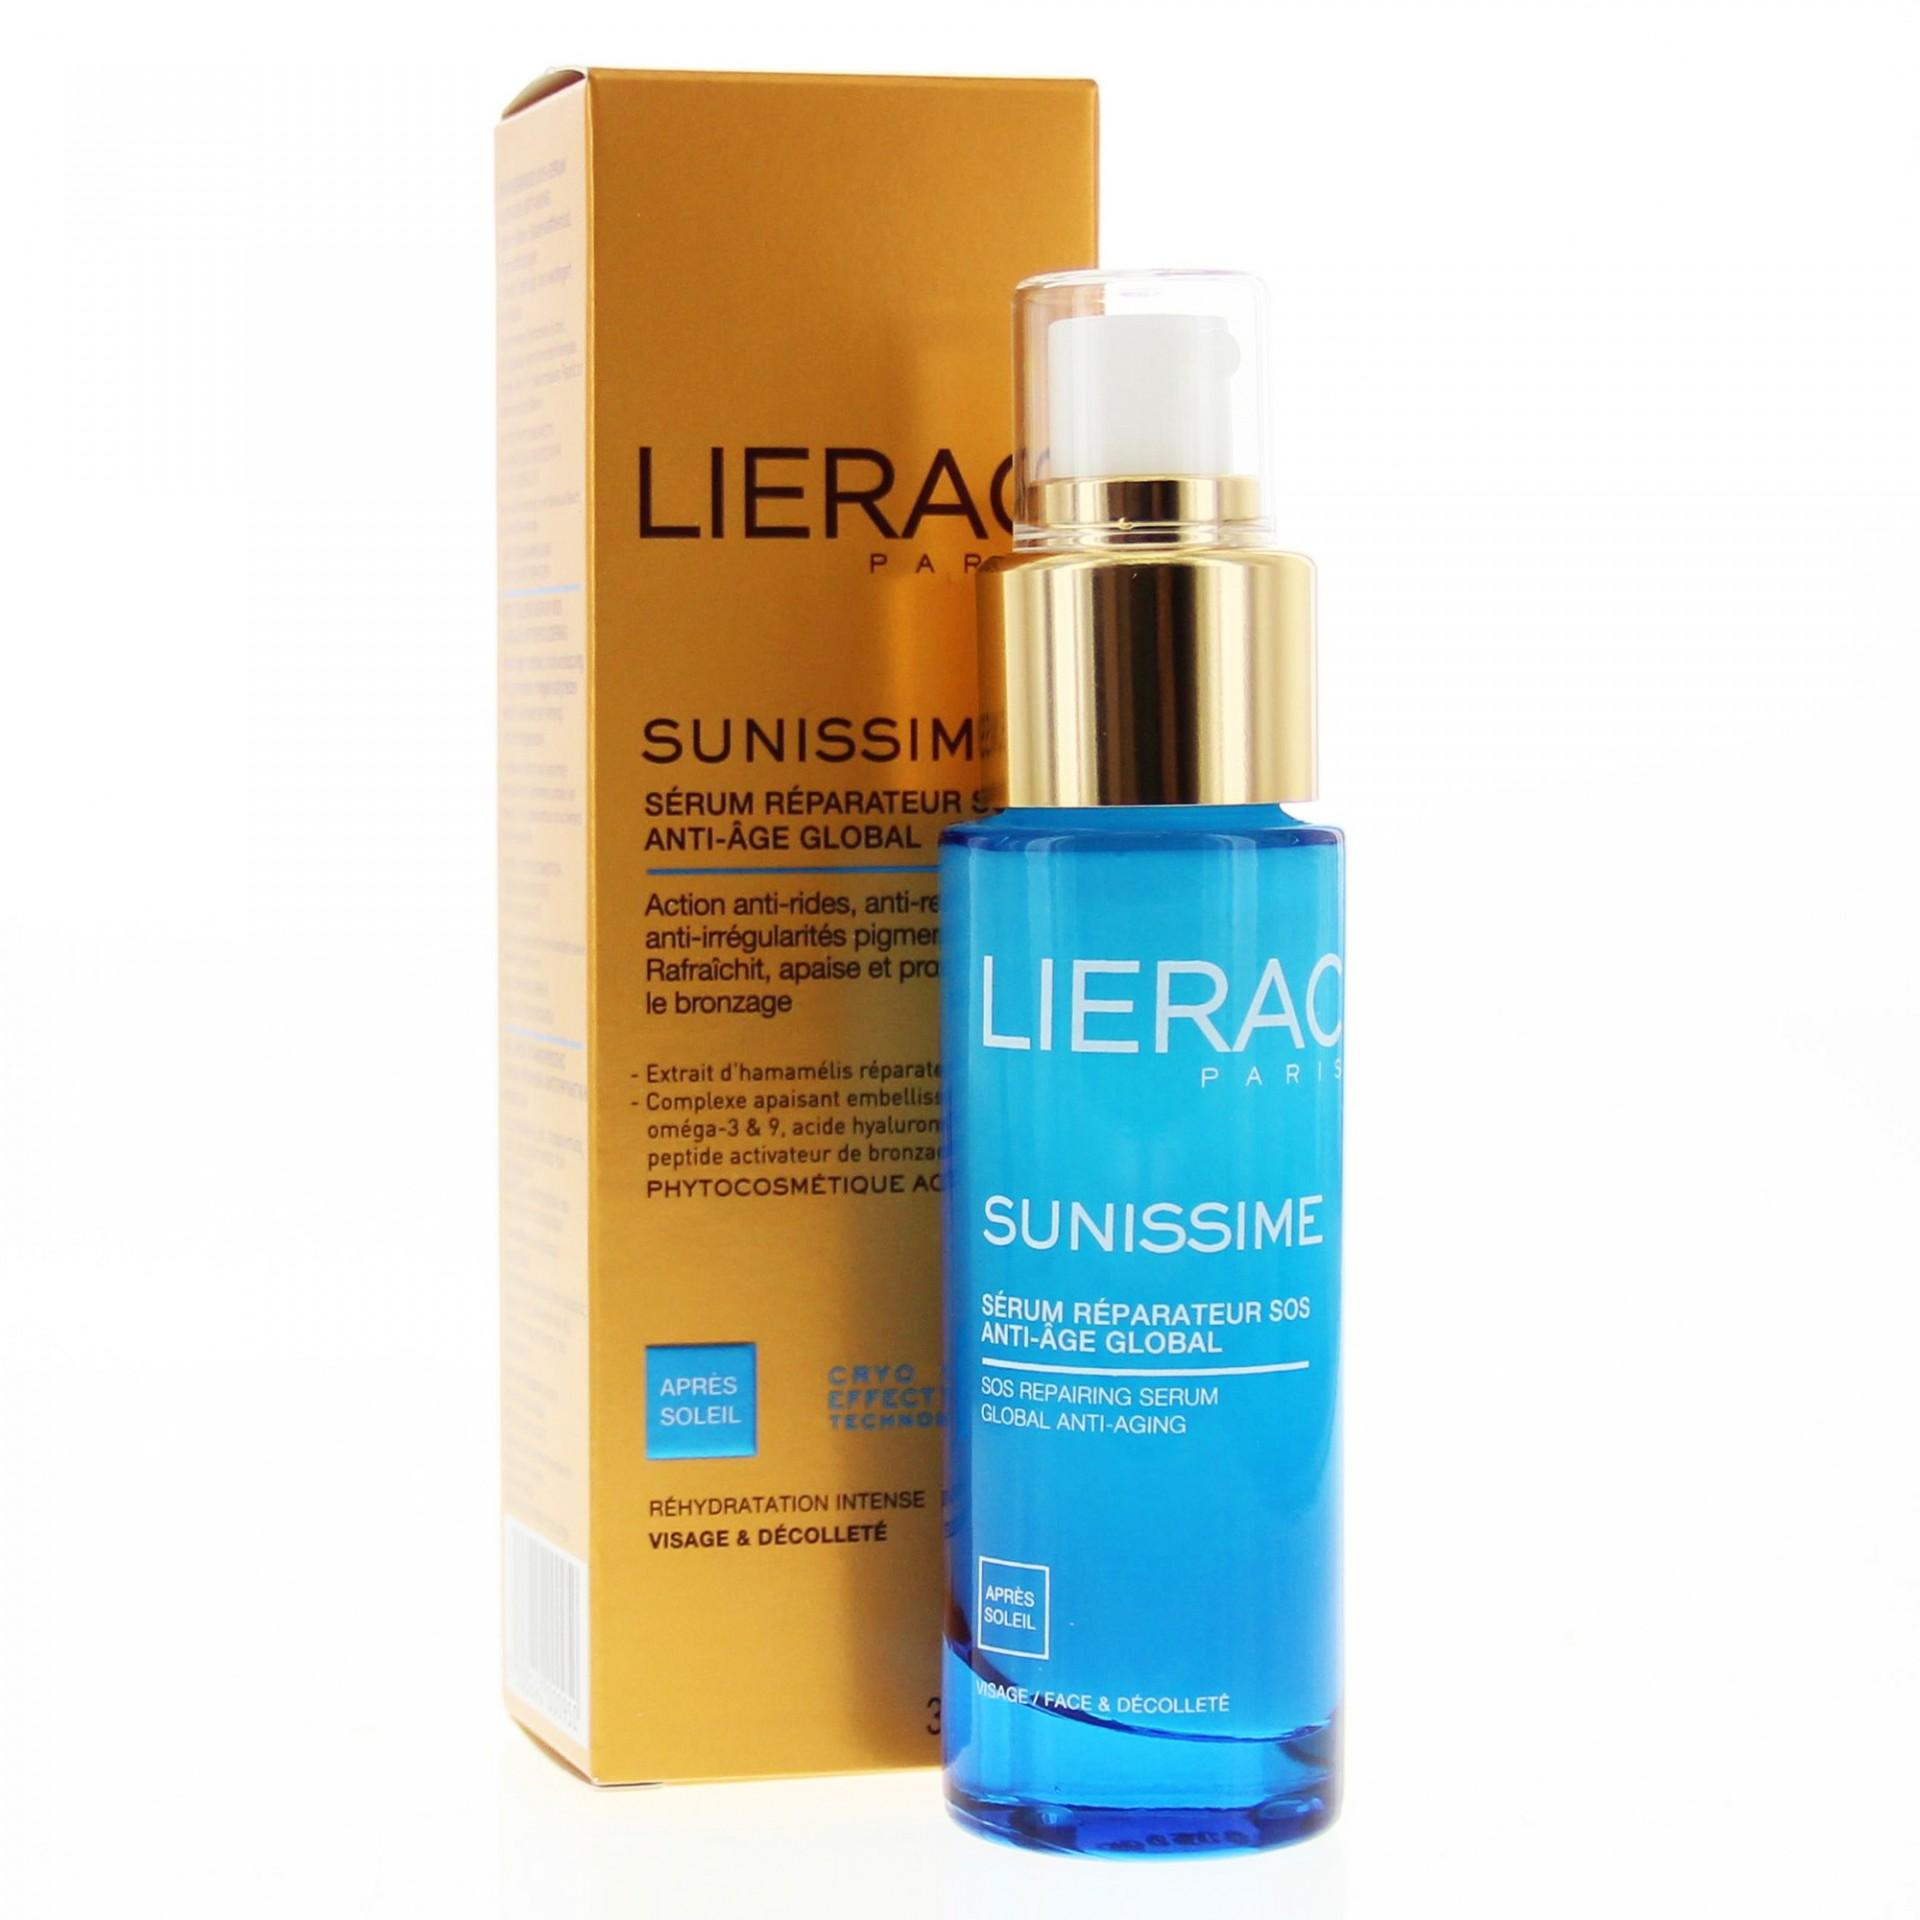 Lierac - Sunissime Serum Reparador Après Soleil 30ml